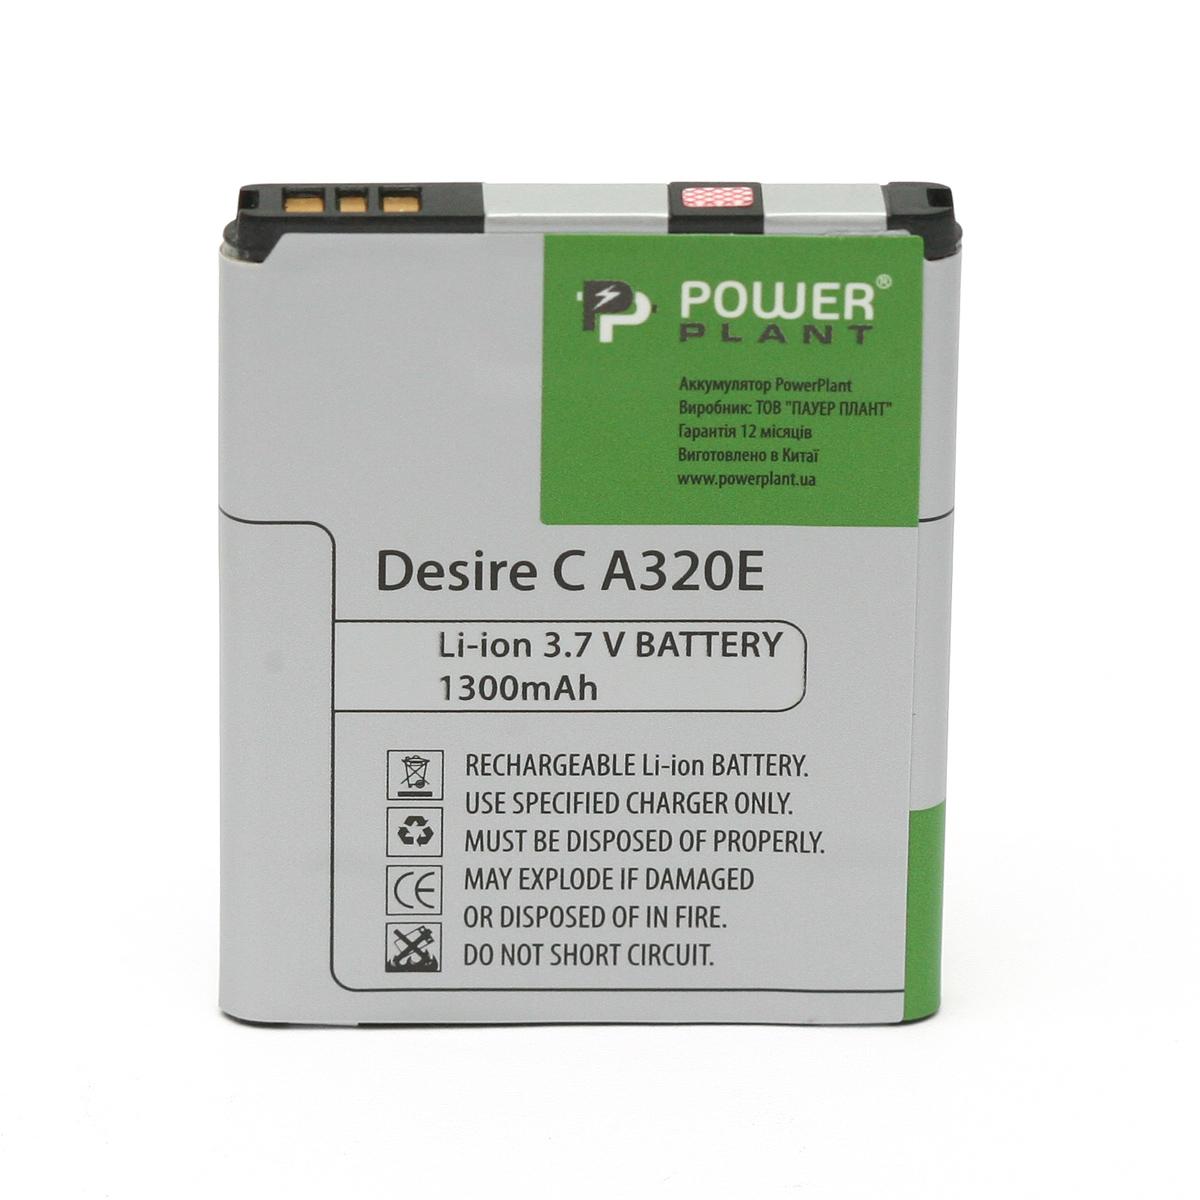 Купить Аккумулятор PowerPlant HTC Desire C A320E (BA S850) 1300mAh